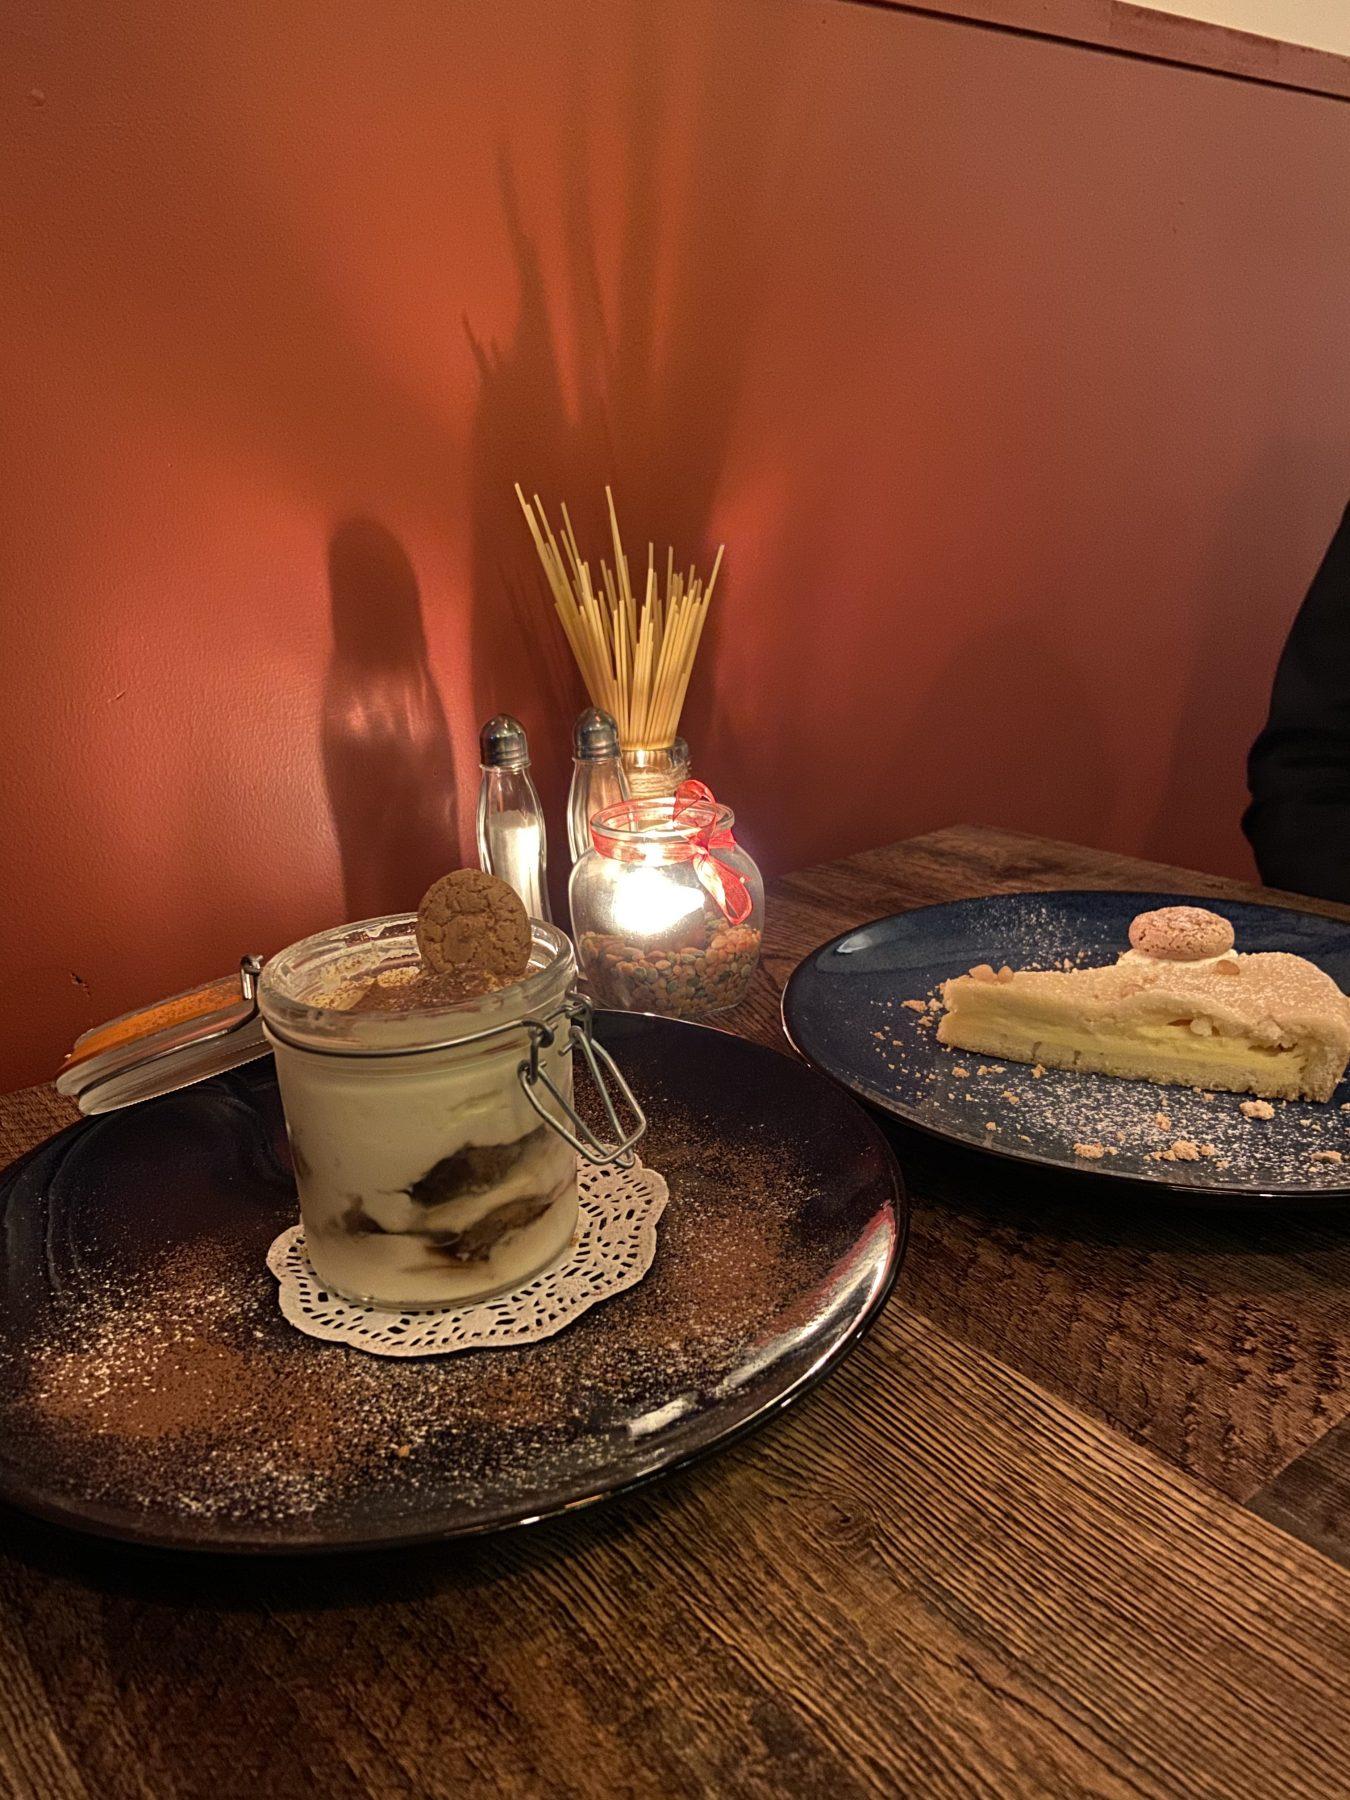 Puglia Restaurant Kingsland Dessert & Candlelit Lighting